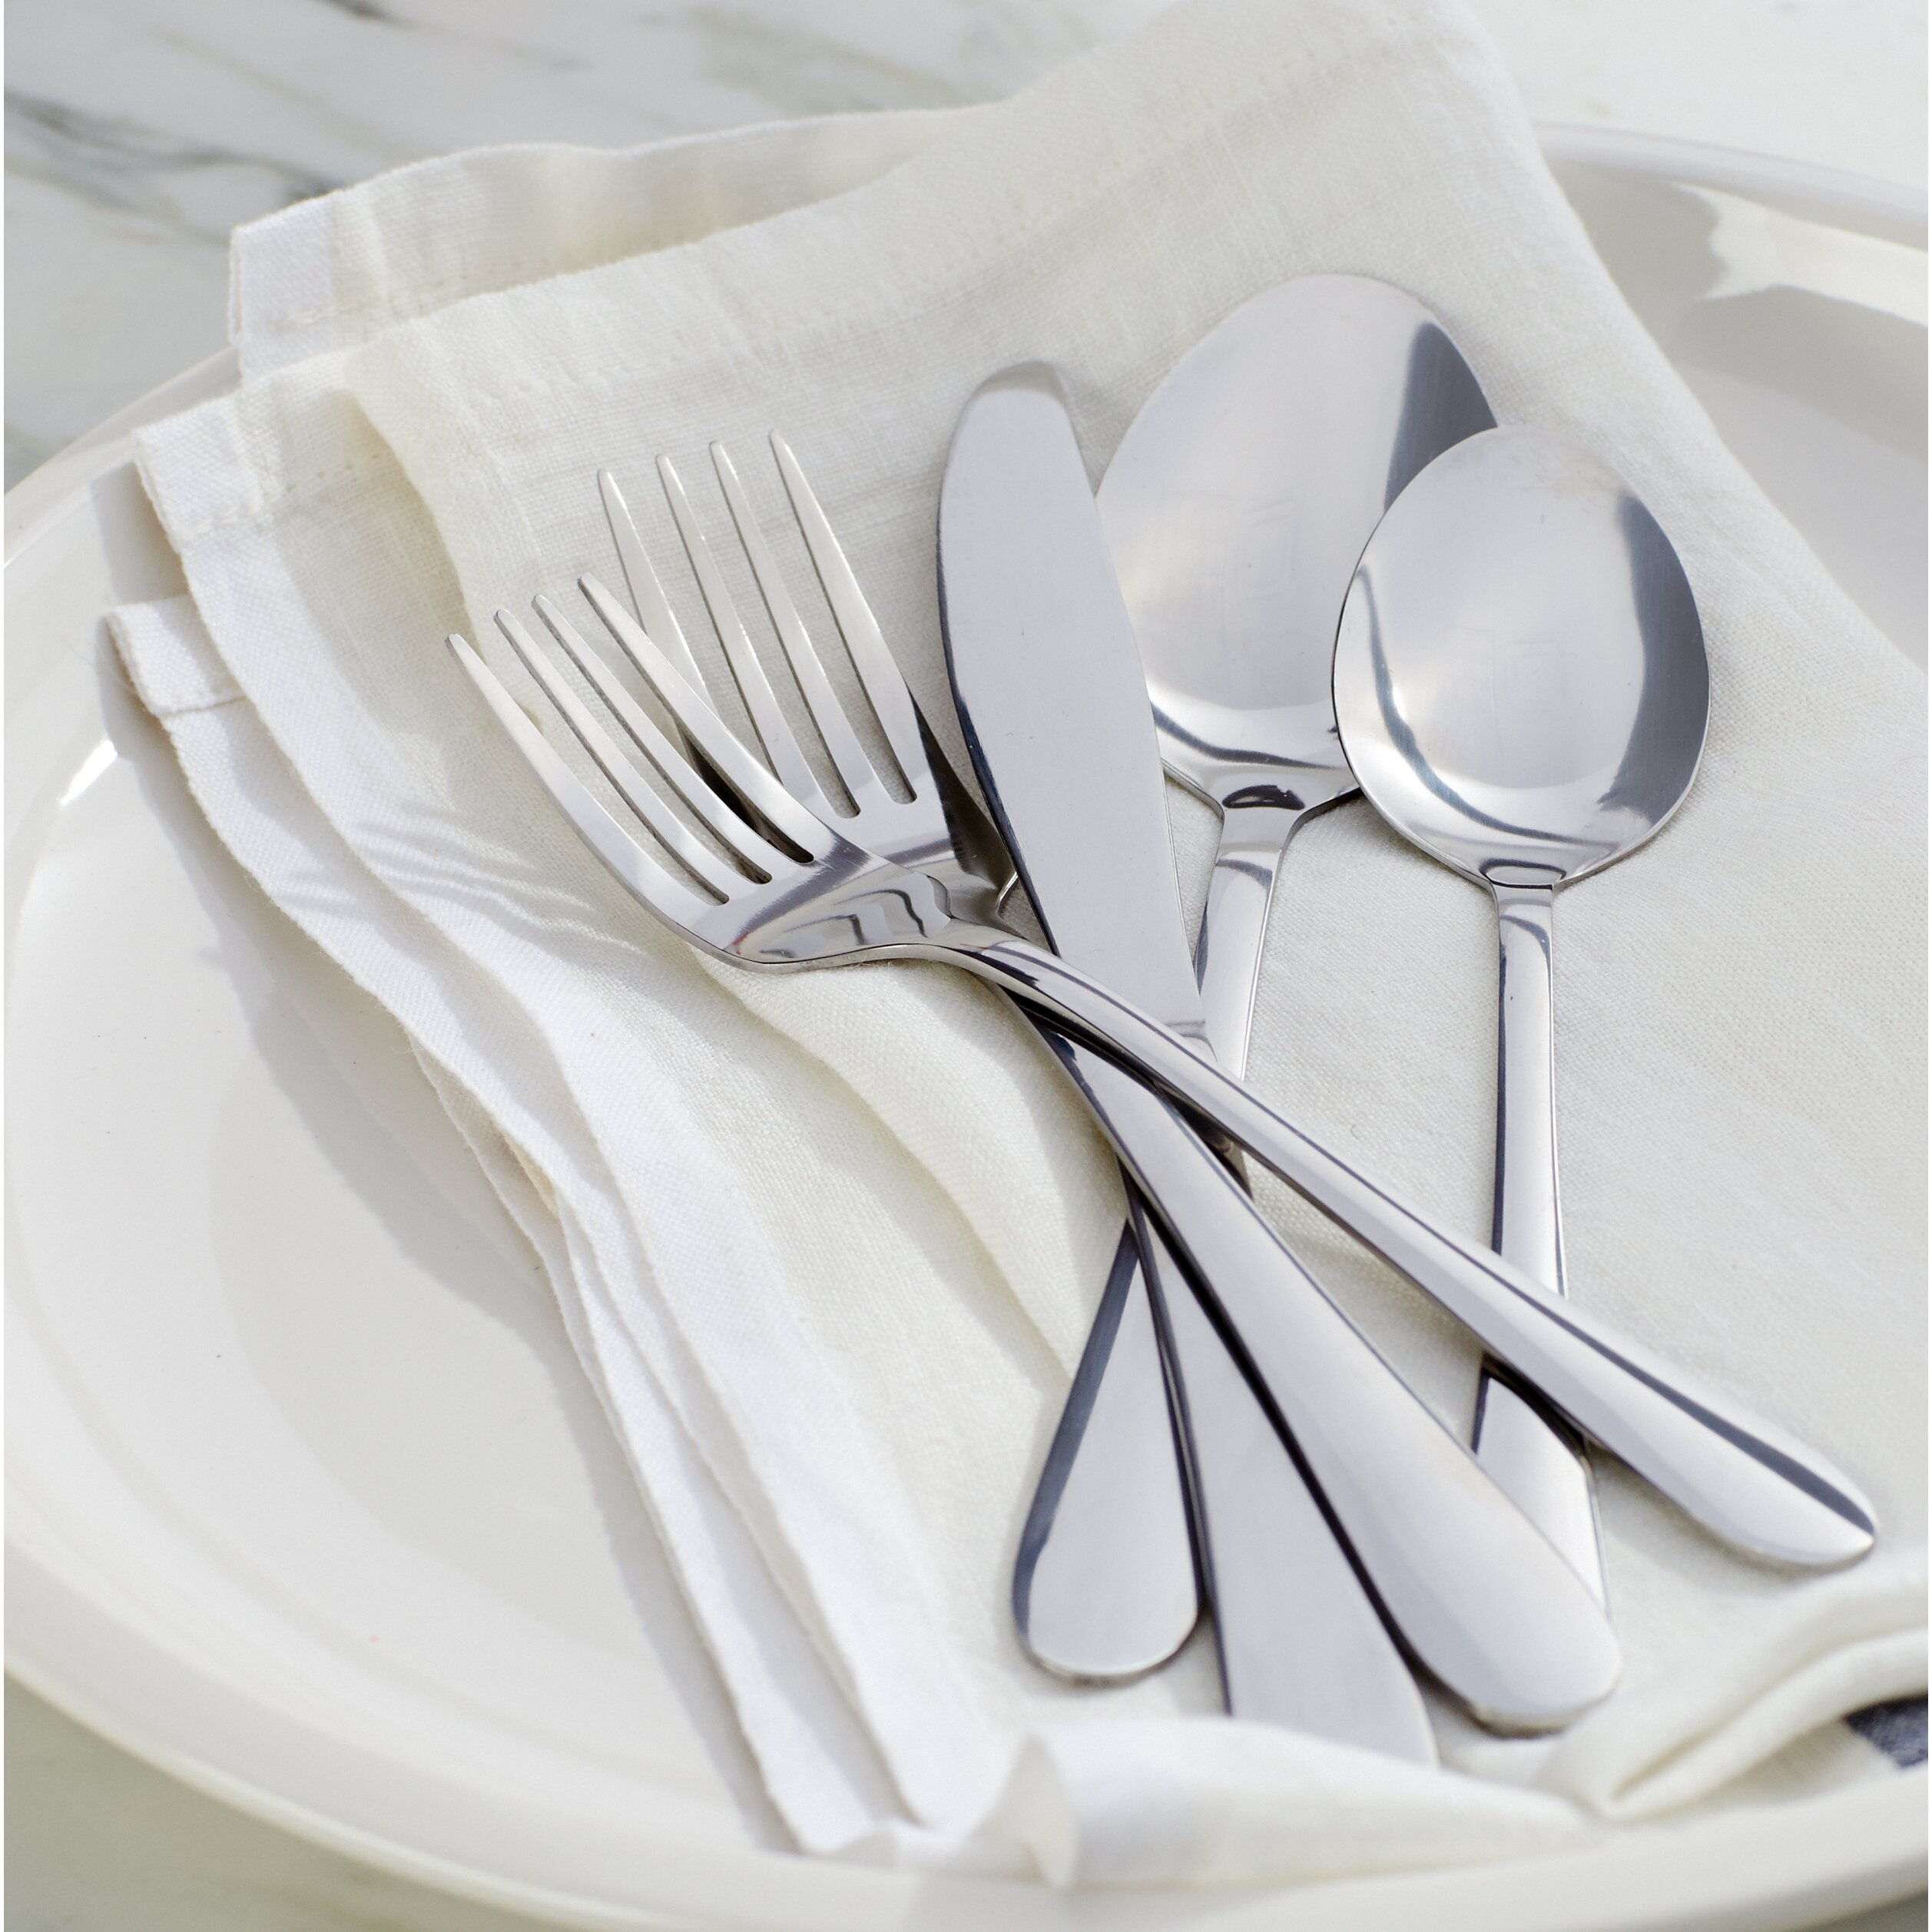 wayfair basics wayfair basics 40 piece stainless steel flatware set reviews. Black Bedroom Furniture Sets. Home Design Ideas